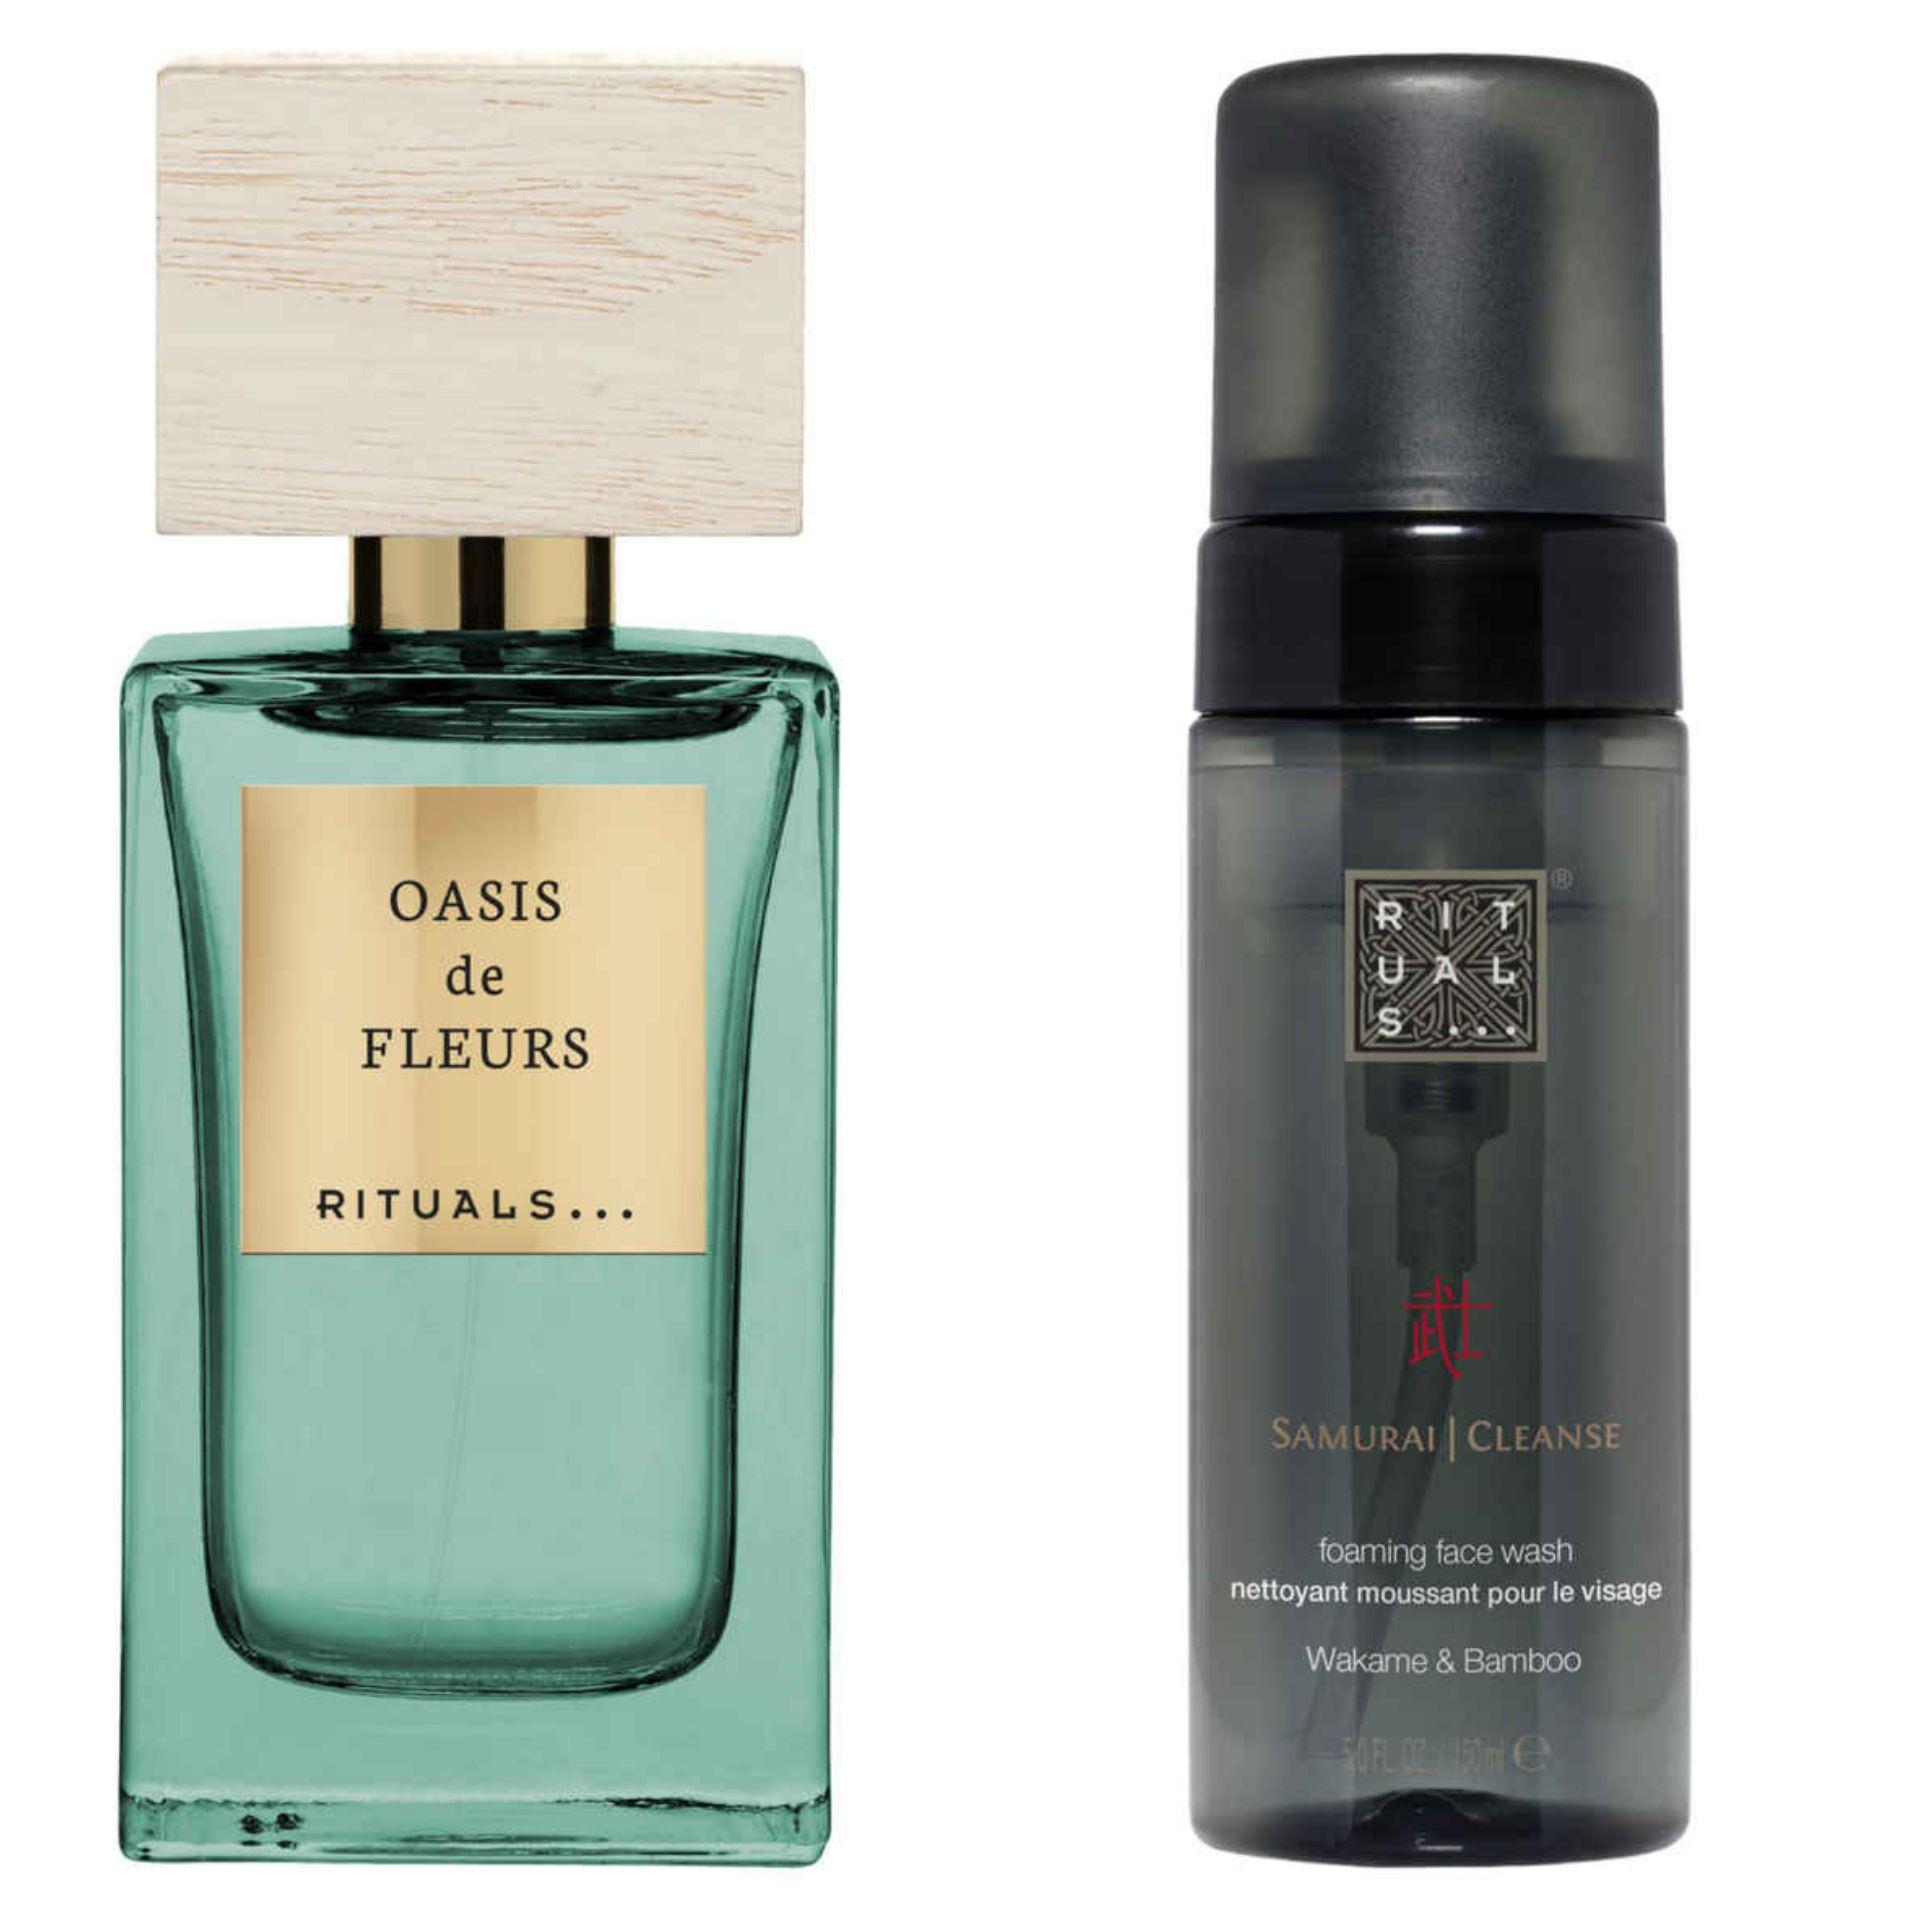 [30% korting] Rituals Oasis de Fleurs parfum 50ml & Samurai foaming face wash @Hudsons Bay